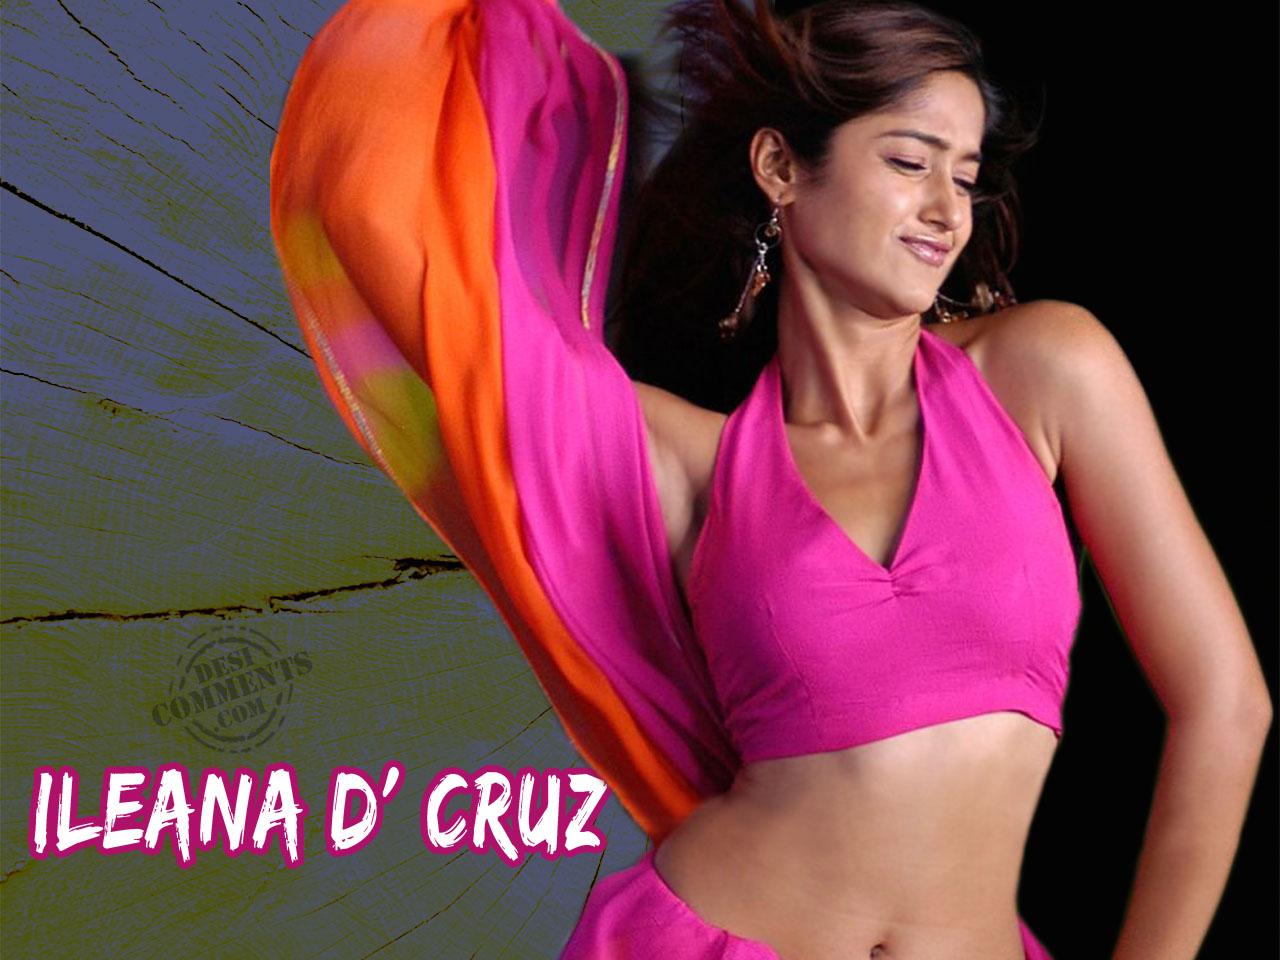 Ileana D Cruz Full Hd Images: Pic New Posts: Ileana Hot Hd Wallpaper